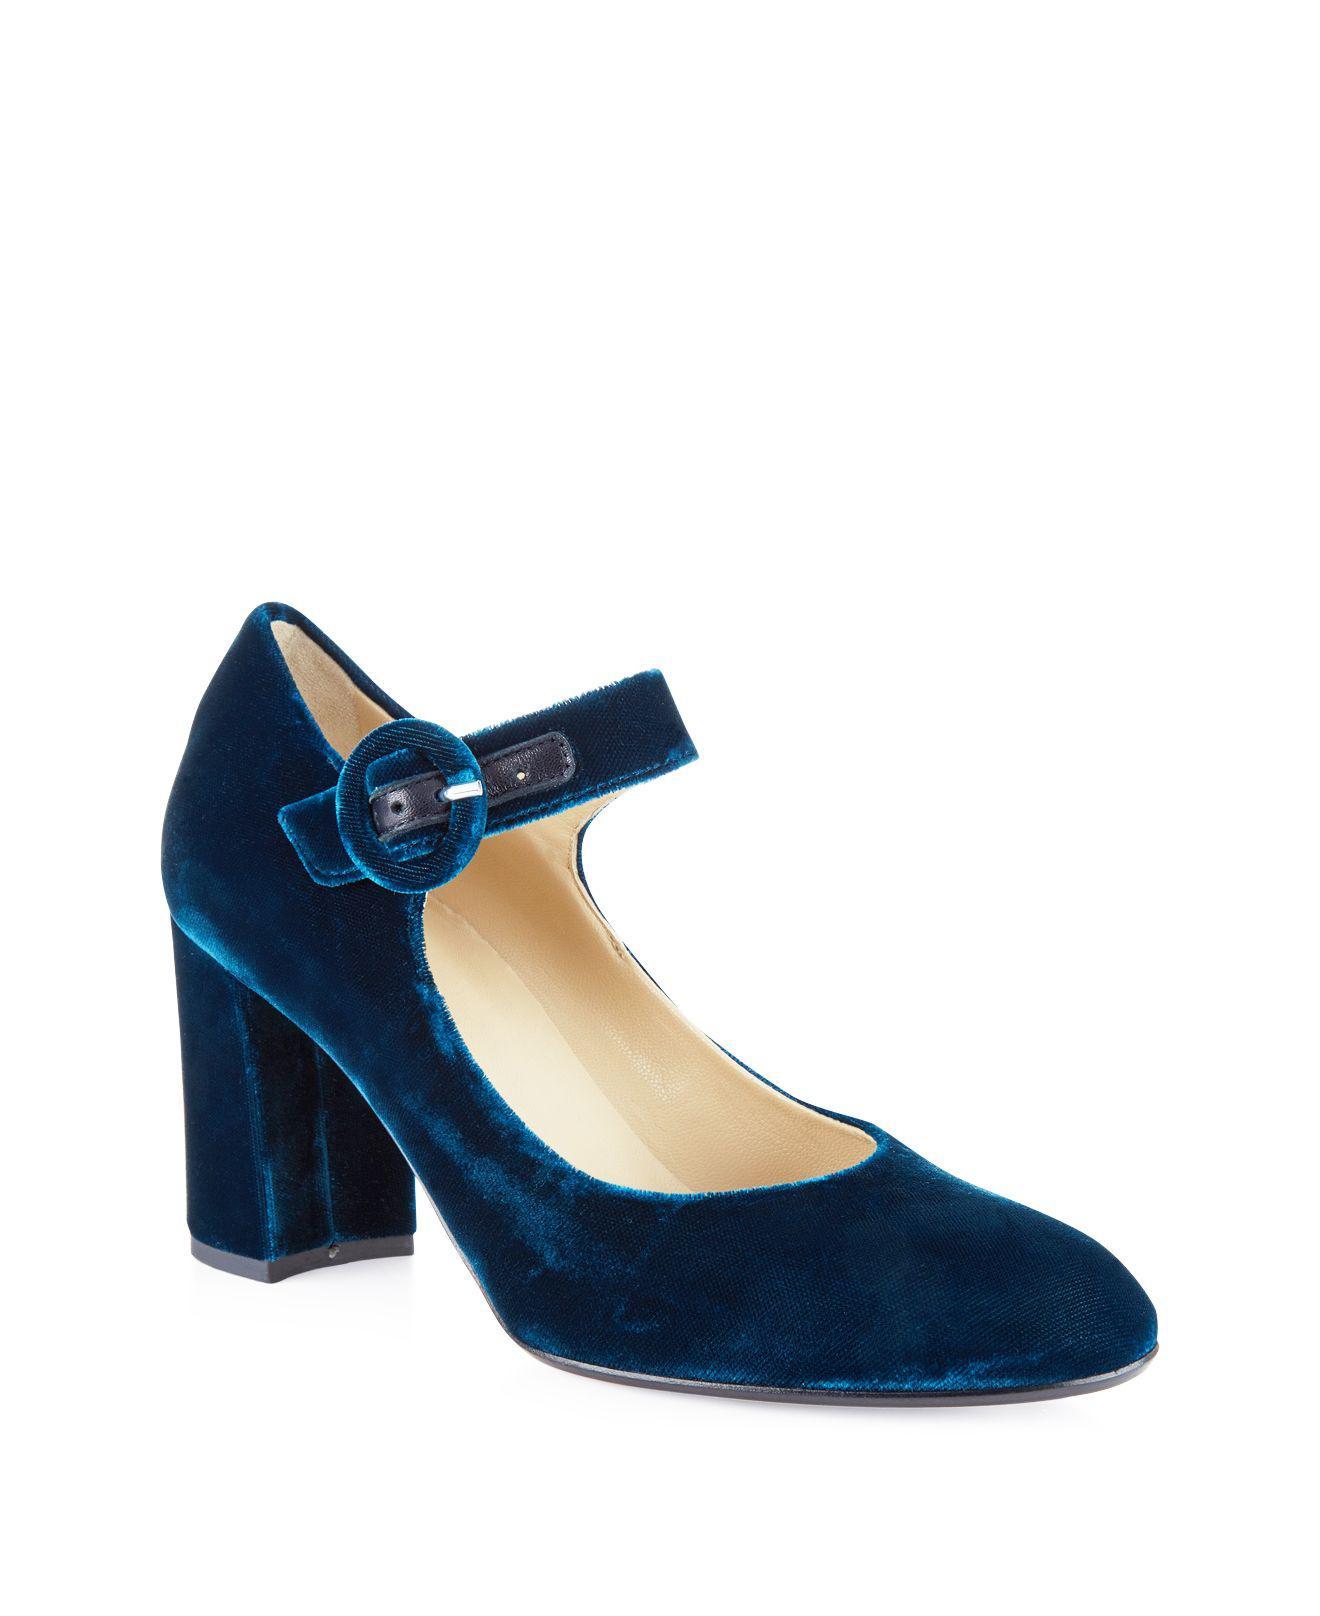 afb50624 Hobbs Aurora Velvet Mary Jane Block Heel Pumps in Natural - Lyst